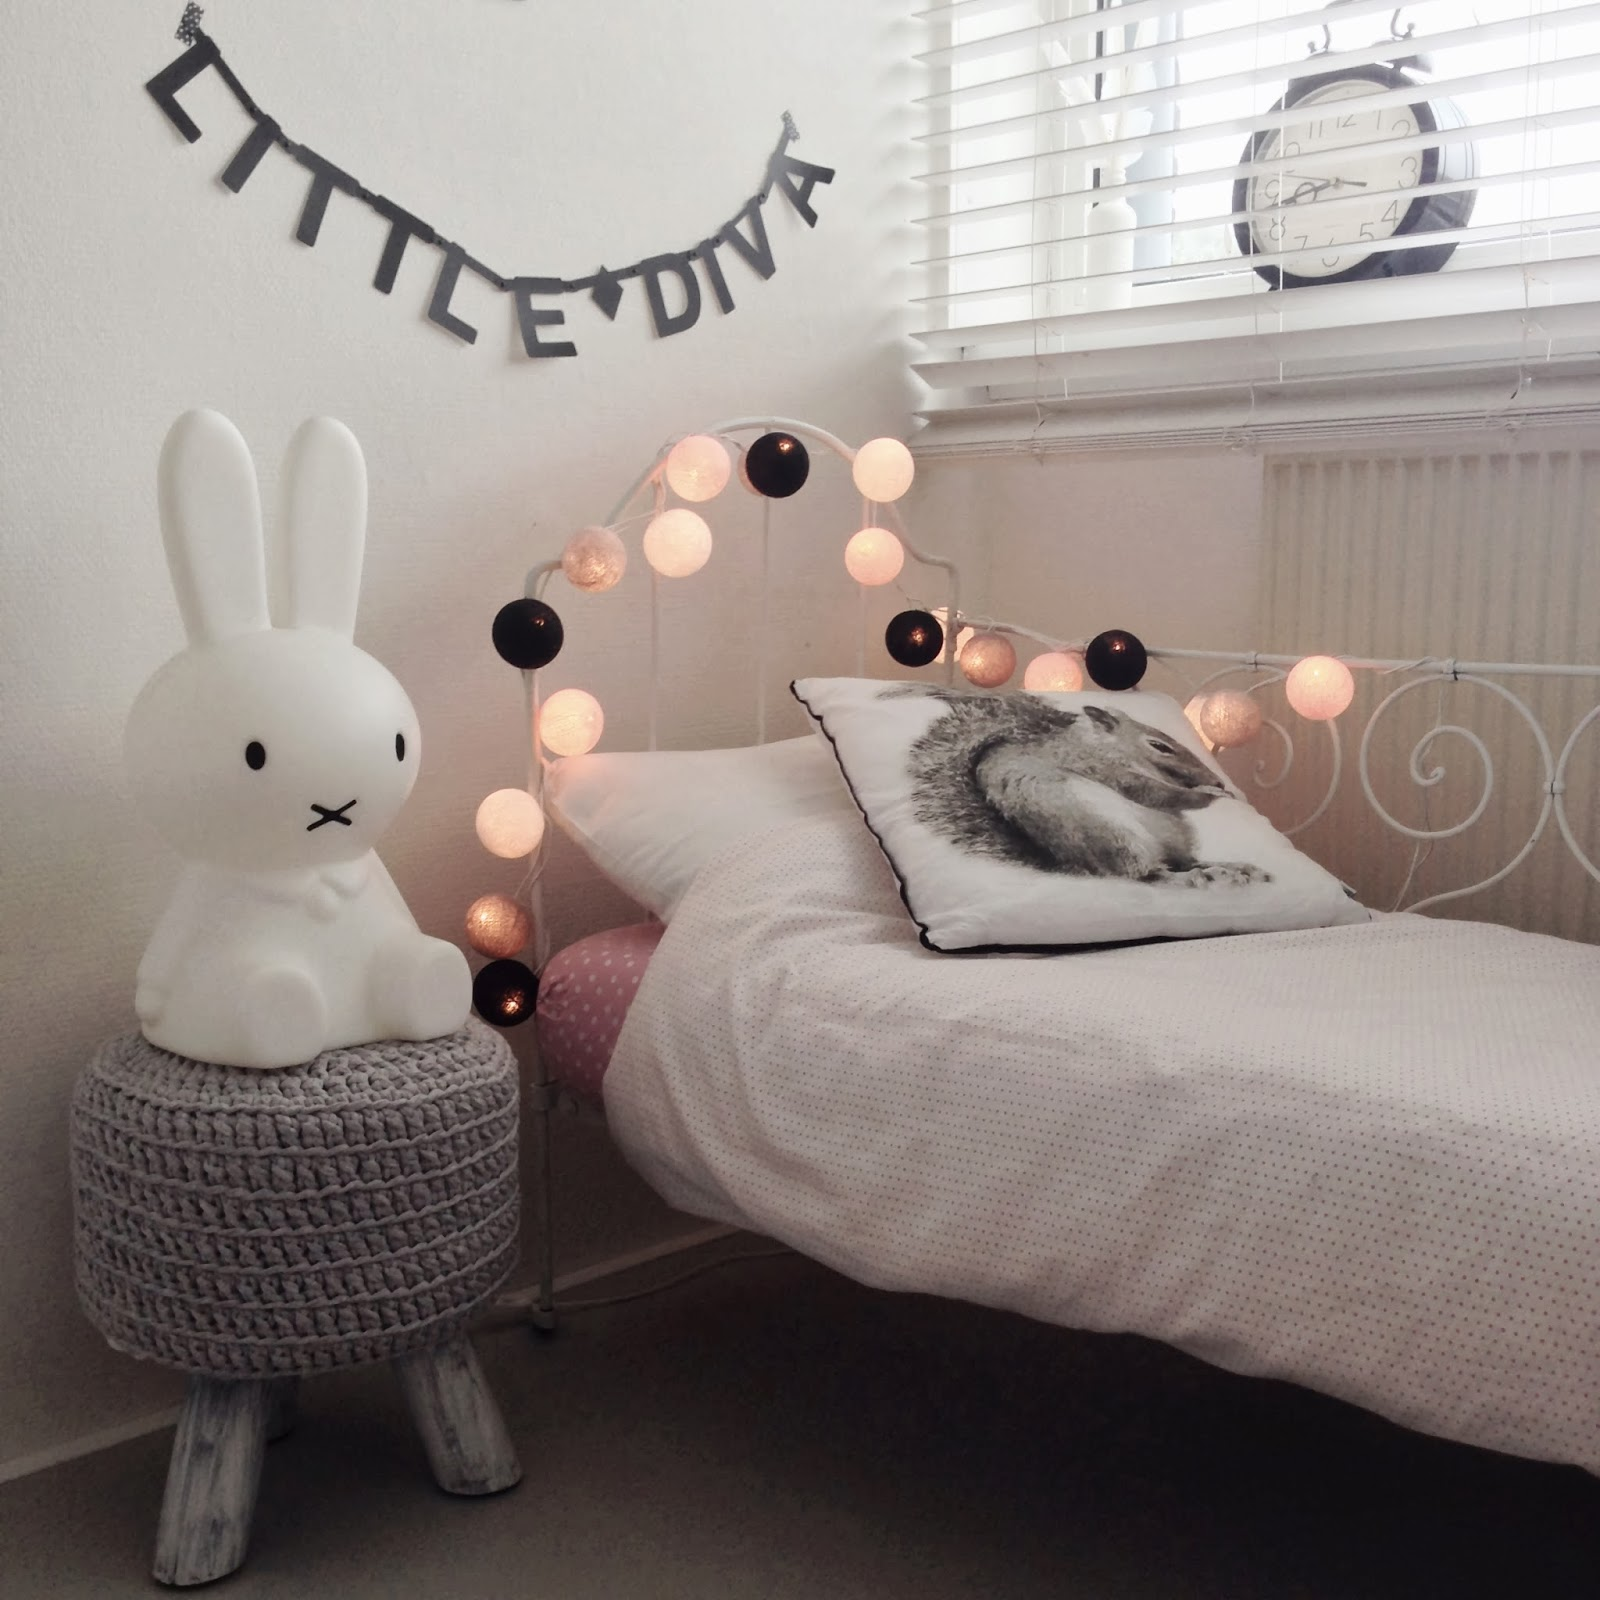 Guirnaldas de luces para convertir la habitaci n de los for Guirnaldas de luces